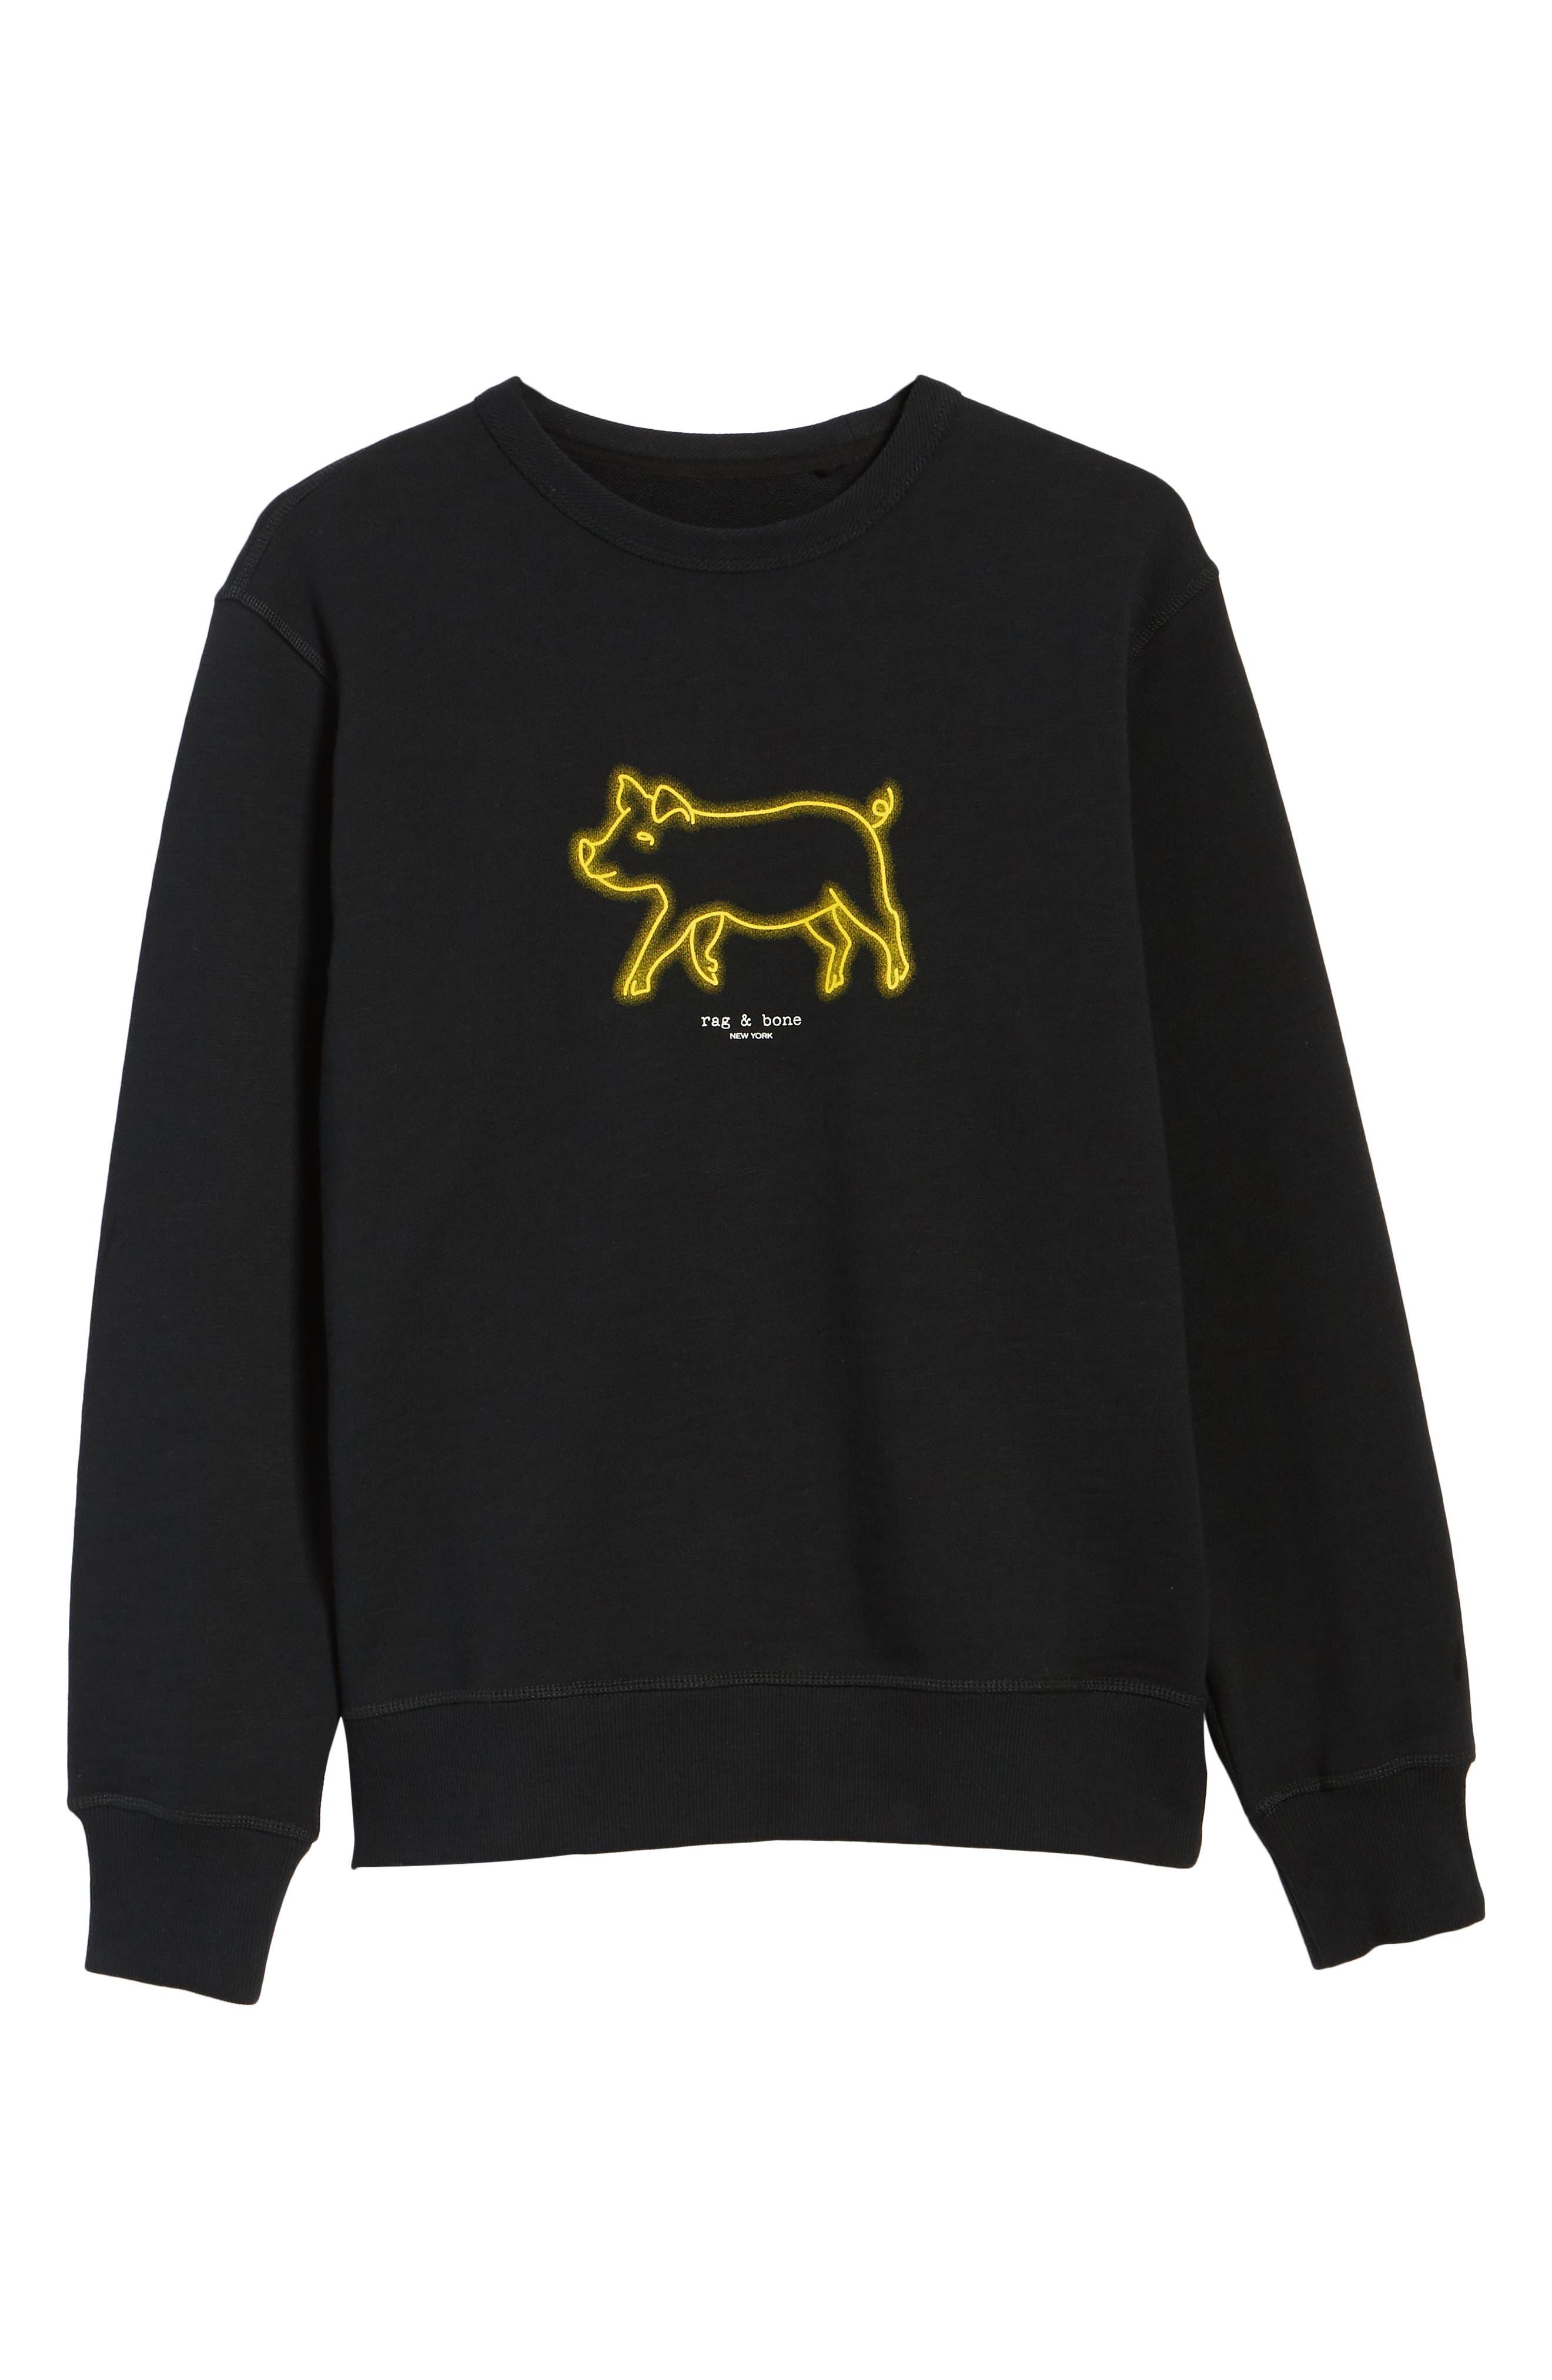 RAG & BONE, Year of the Pig Graphic Sweatshirt, Alternate thumbnail 6, color, BLACK